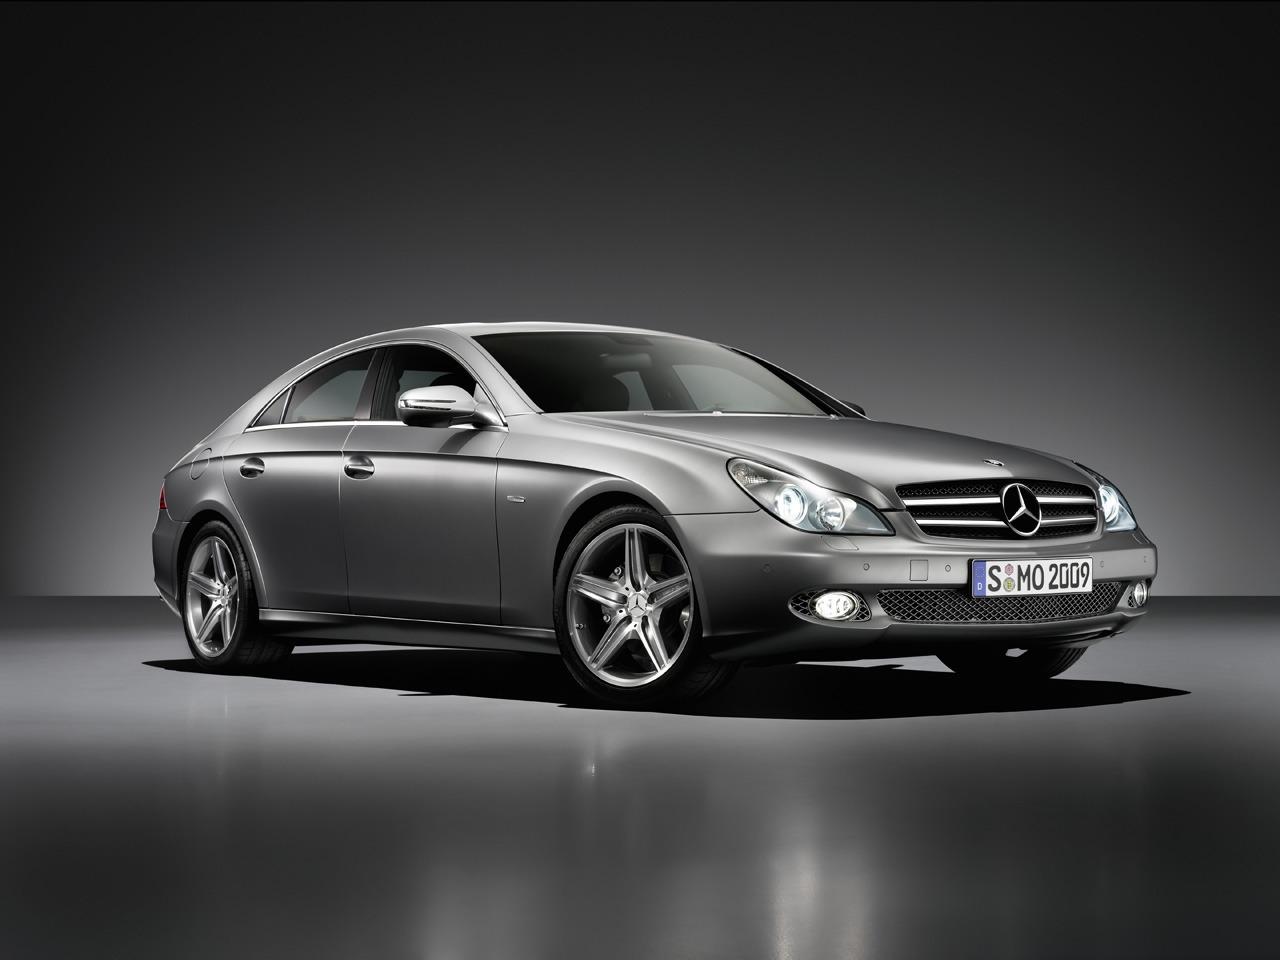 2009 Mercedes Benz Cls Class Image 12